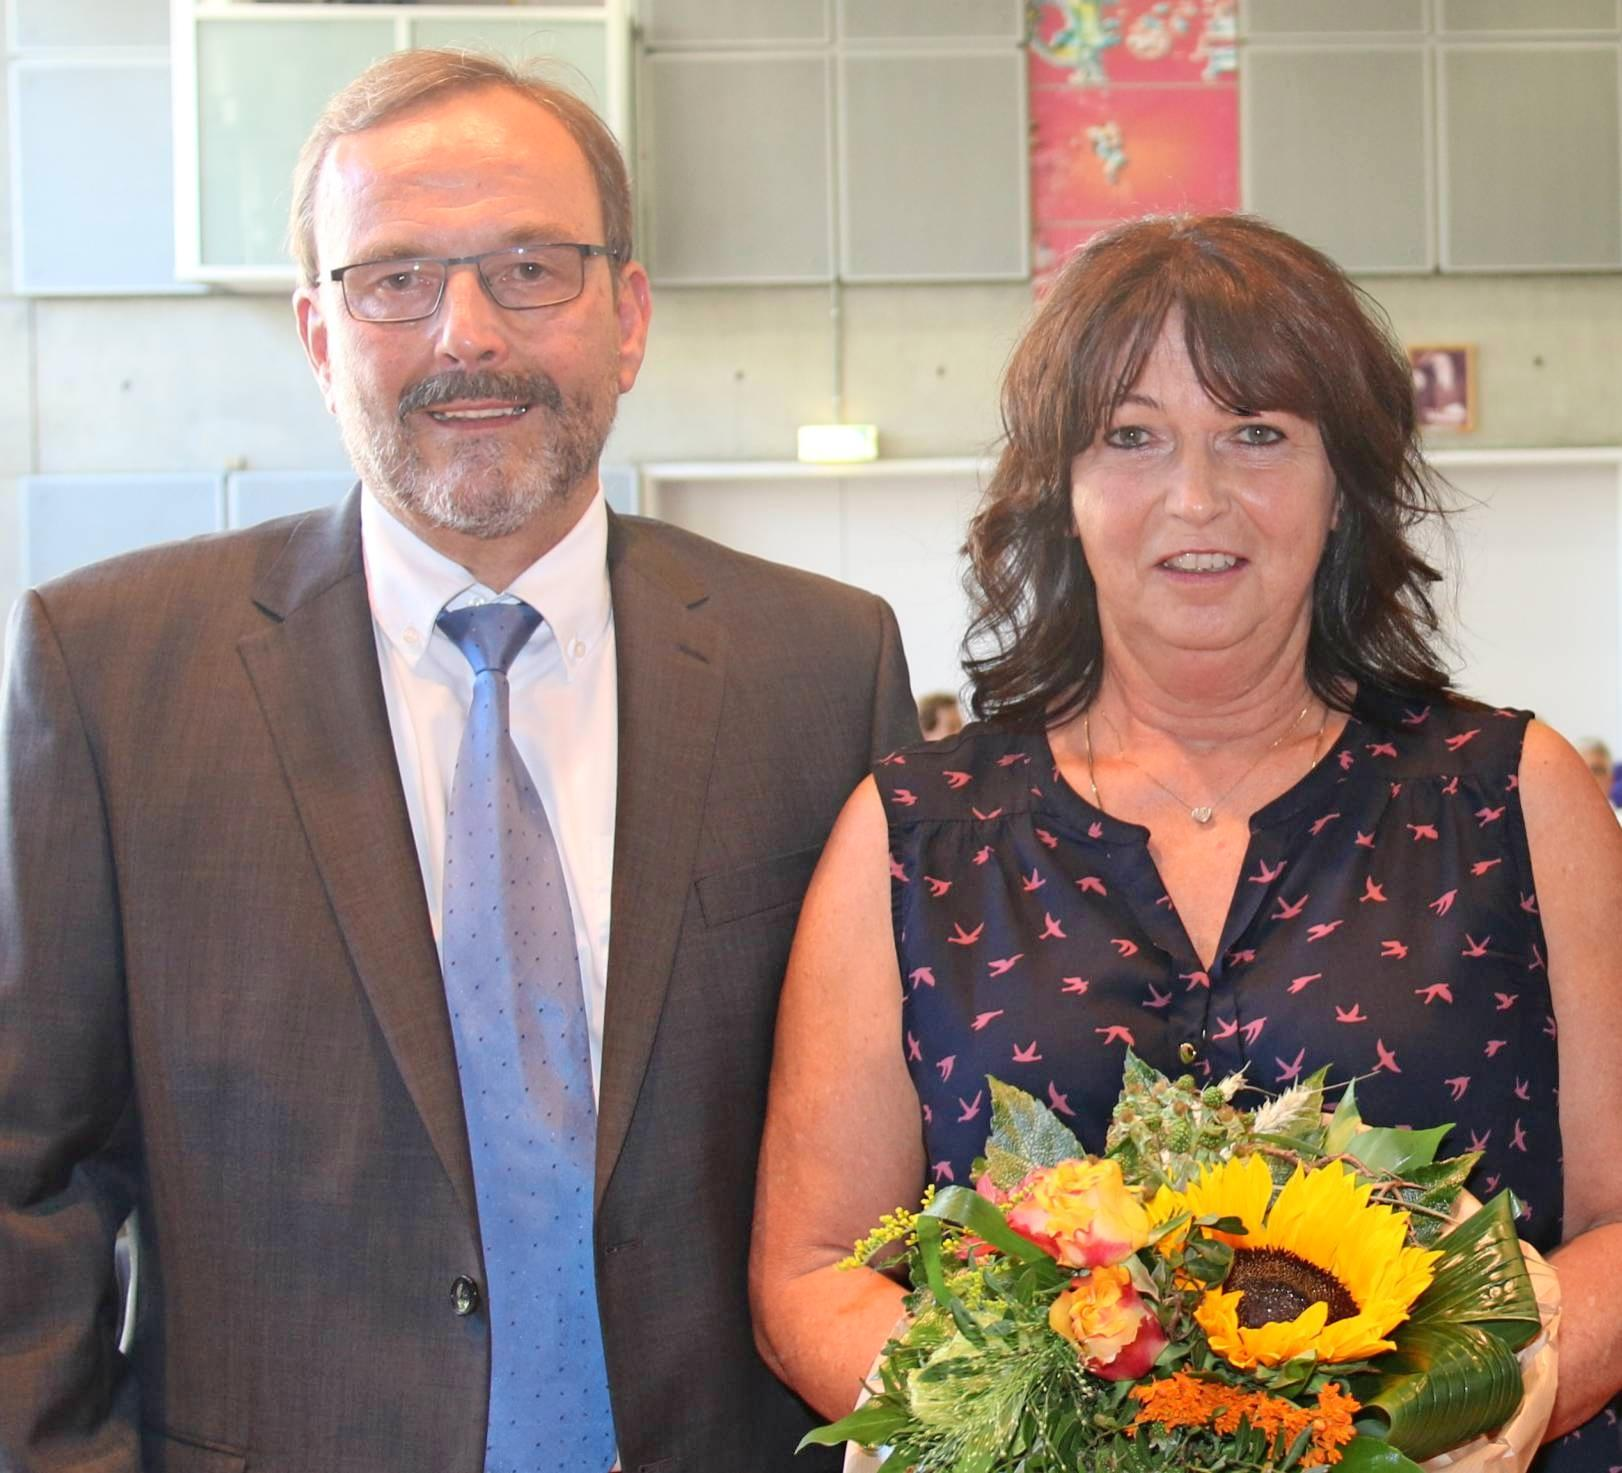 Dahenfelds Ortsvorsteher Johann Habla mit Ehefrau Martina. Foto: snp